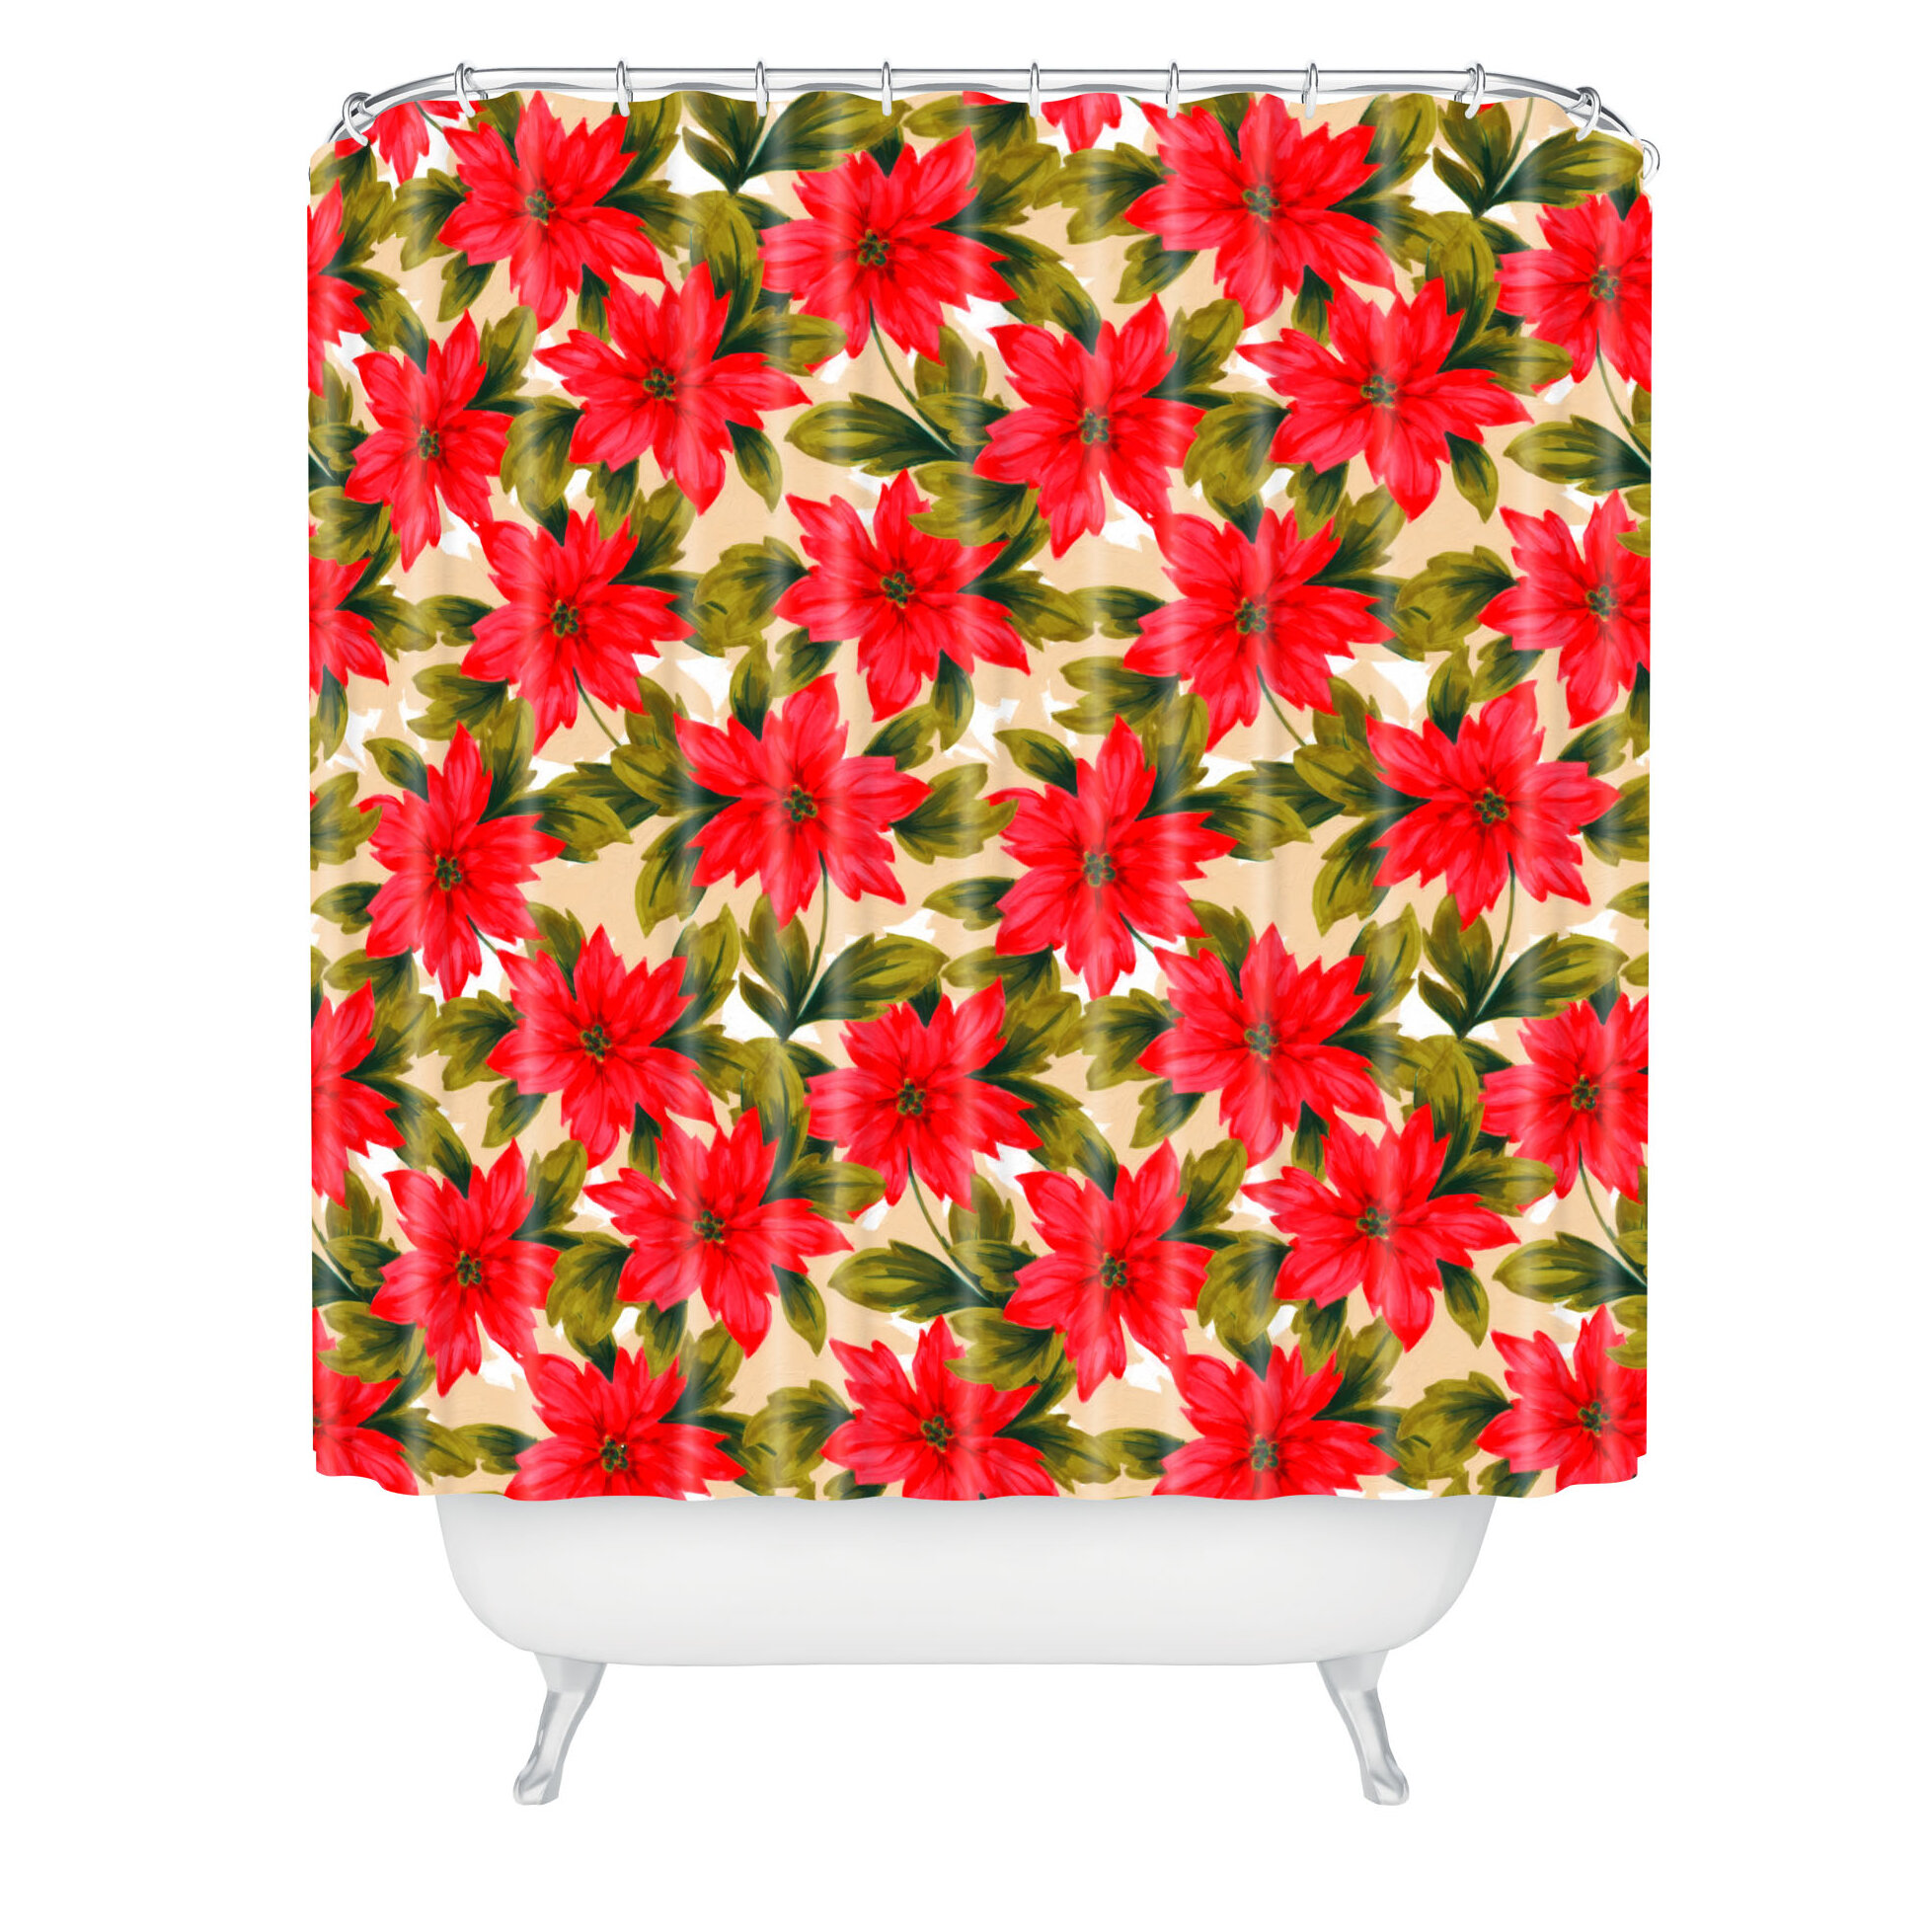 The Holiday Aisle Jade Poinsettia Shower Curtain